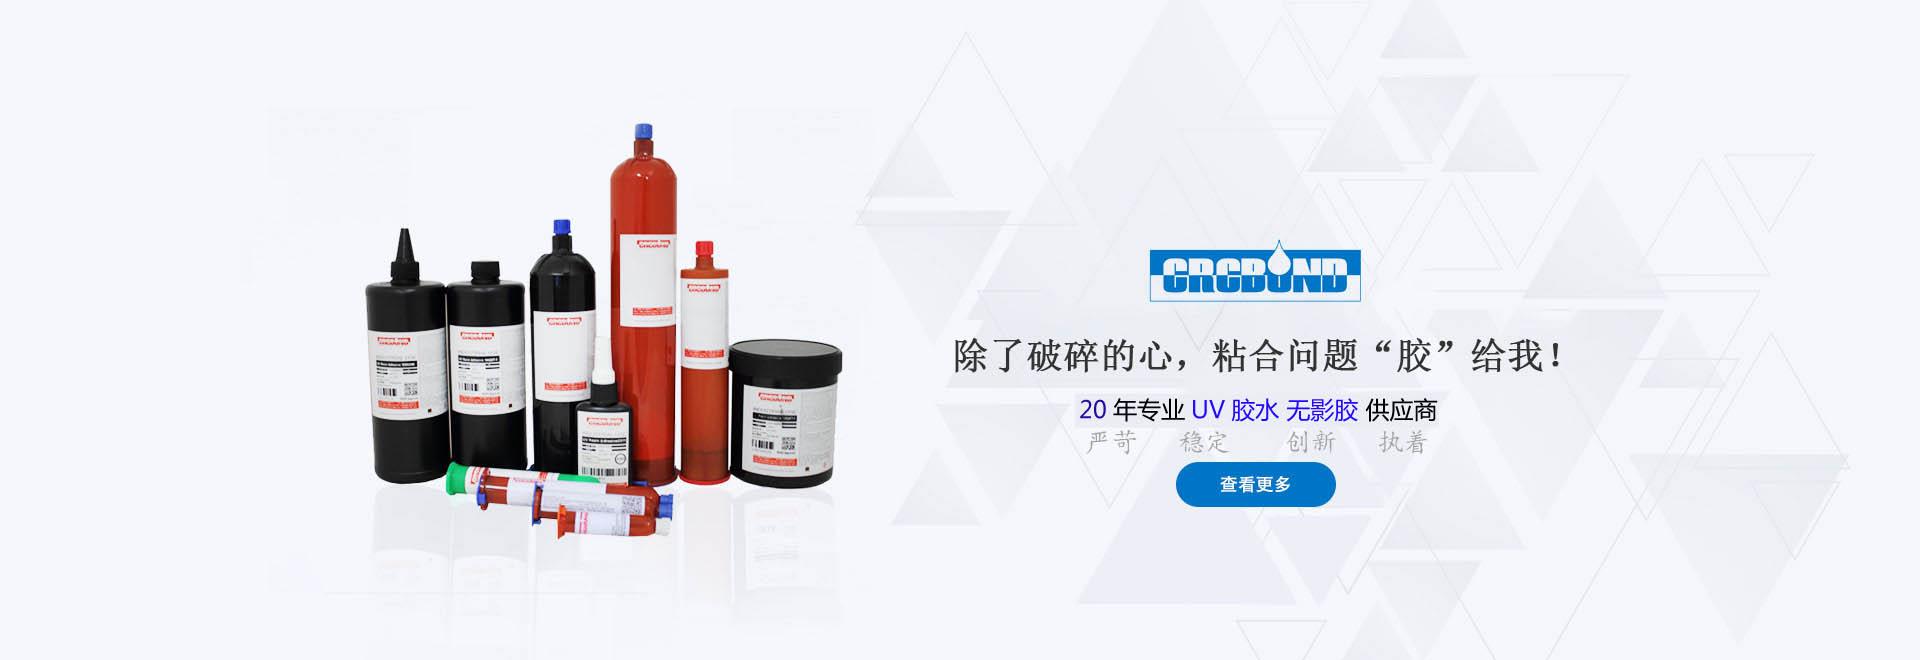 UV胶水_UV胶_UV胶固化灯生产厂家供应商 www.uvglue.cn